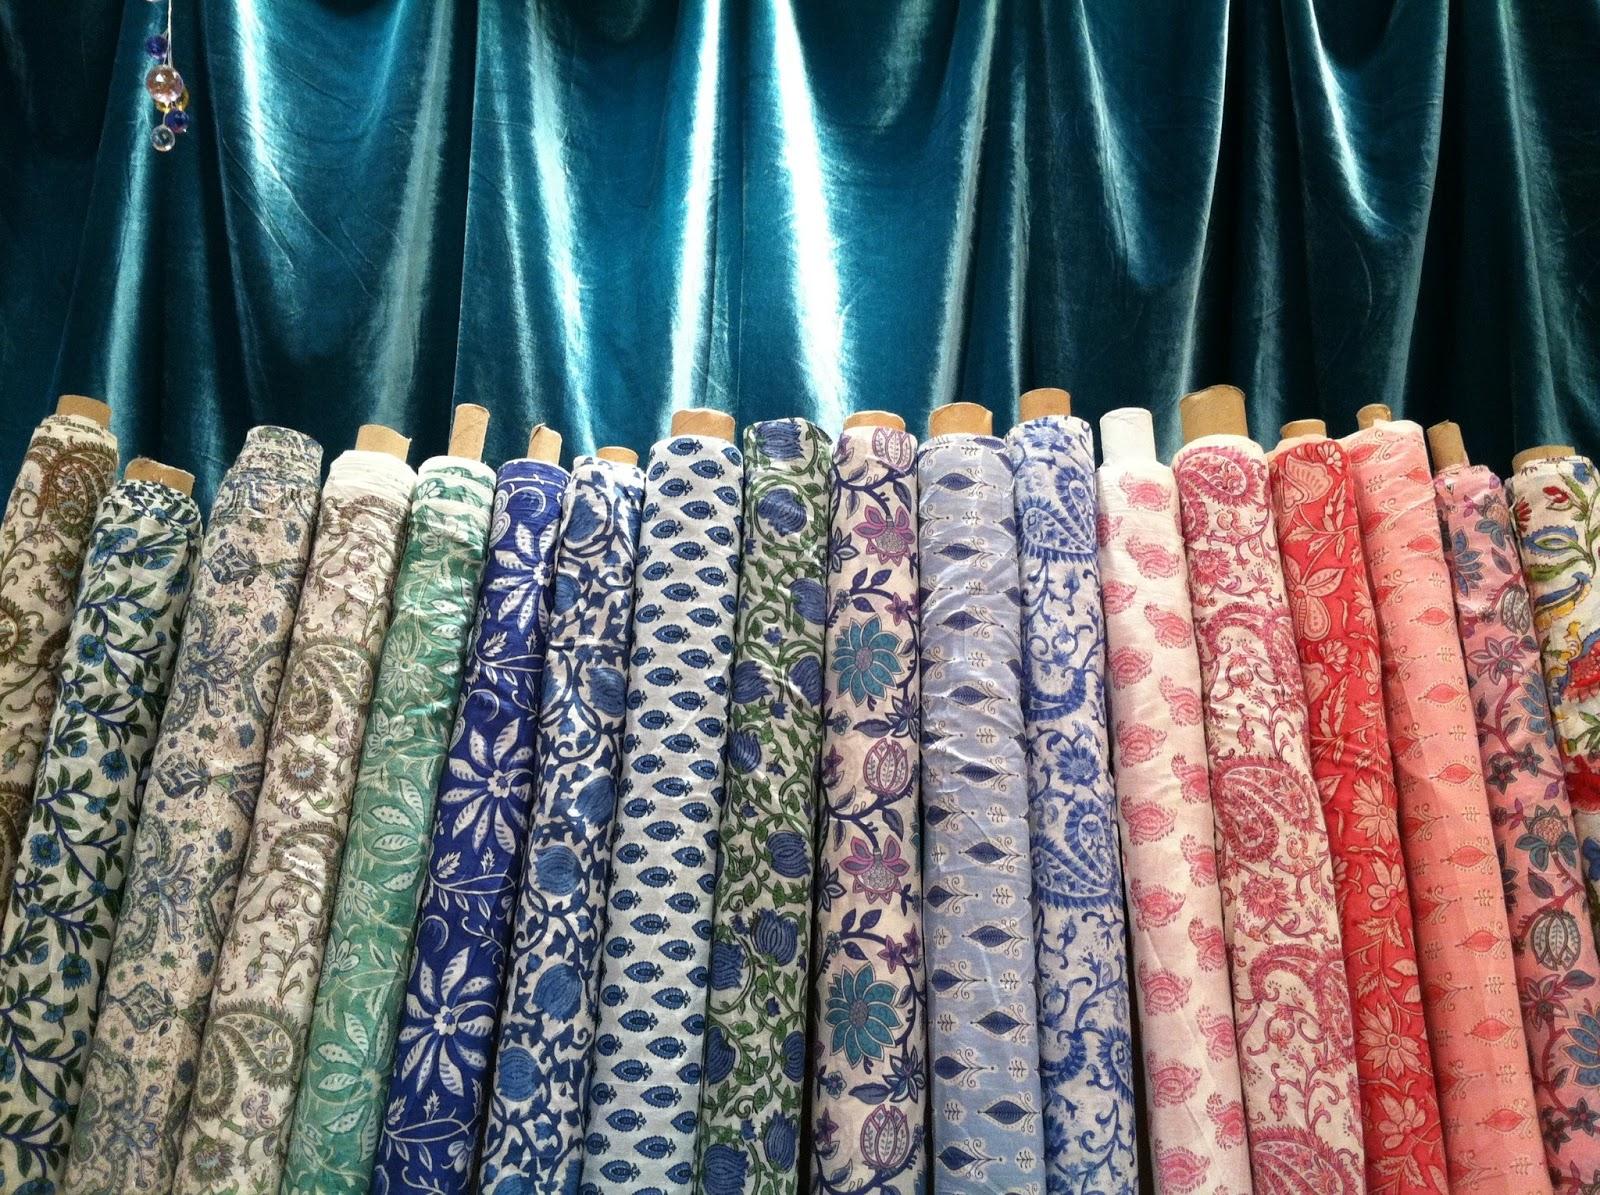 Common Thread Lightweight Hand Woodblock Printed Cotton Voile Fabrics